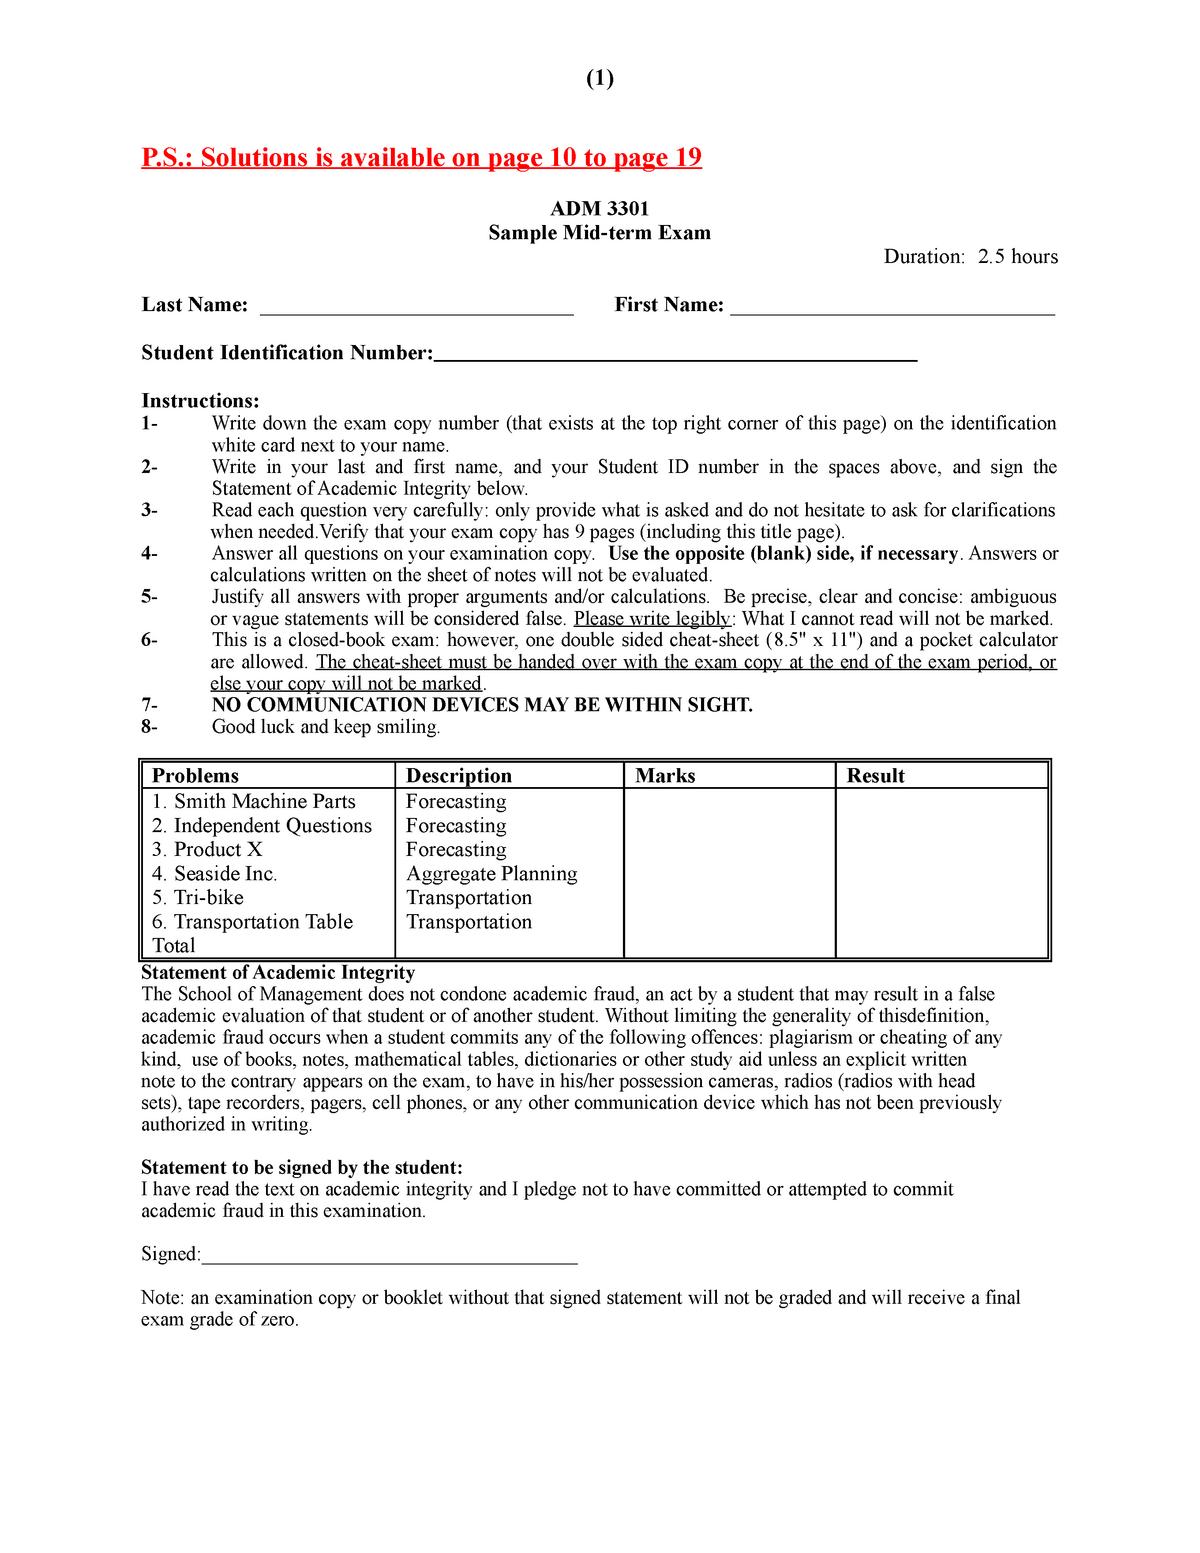 Exam 2016 - ADM3301: Operations Management - StuDocu